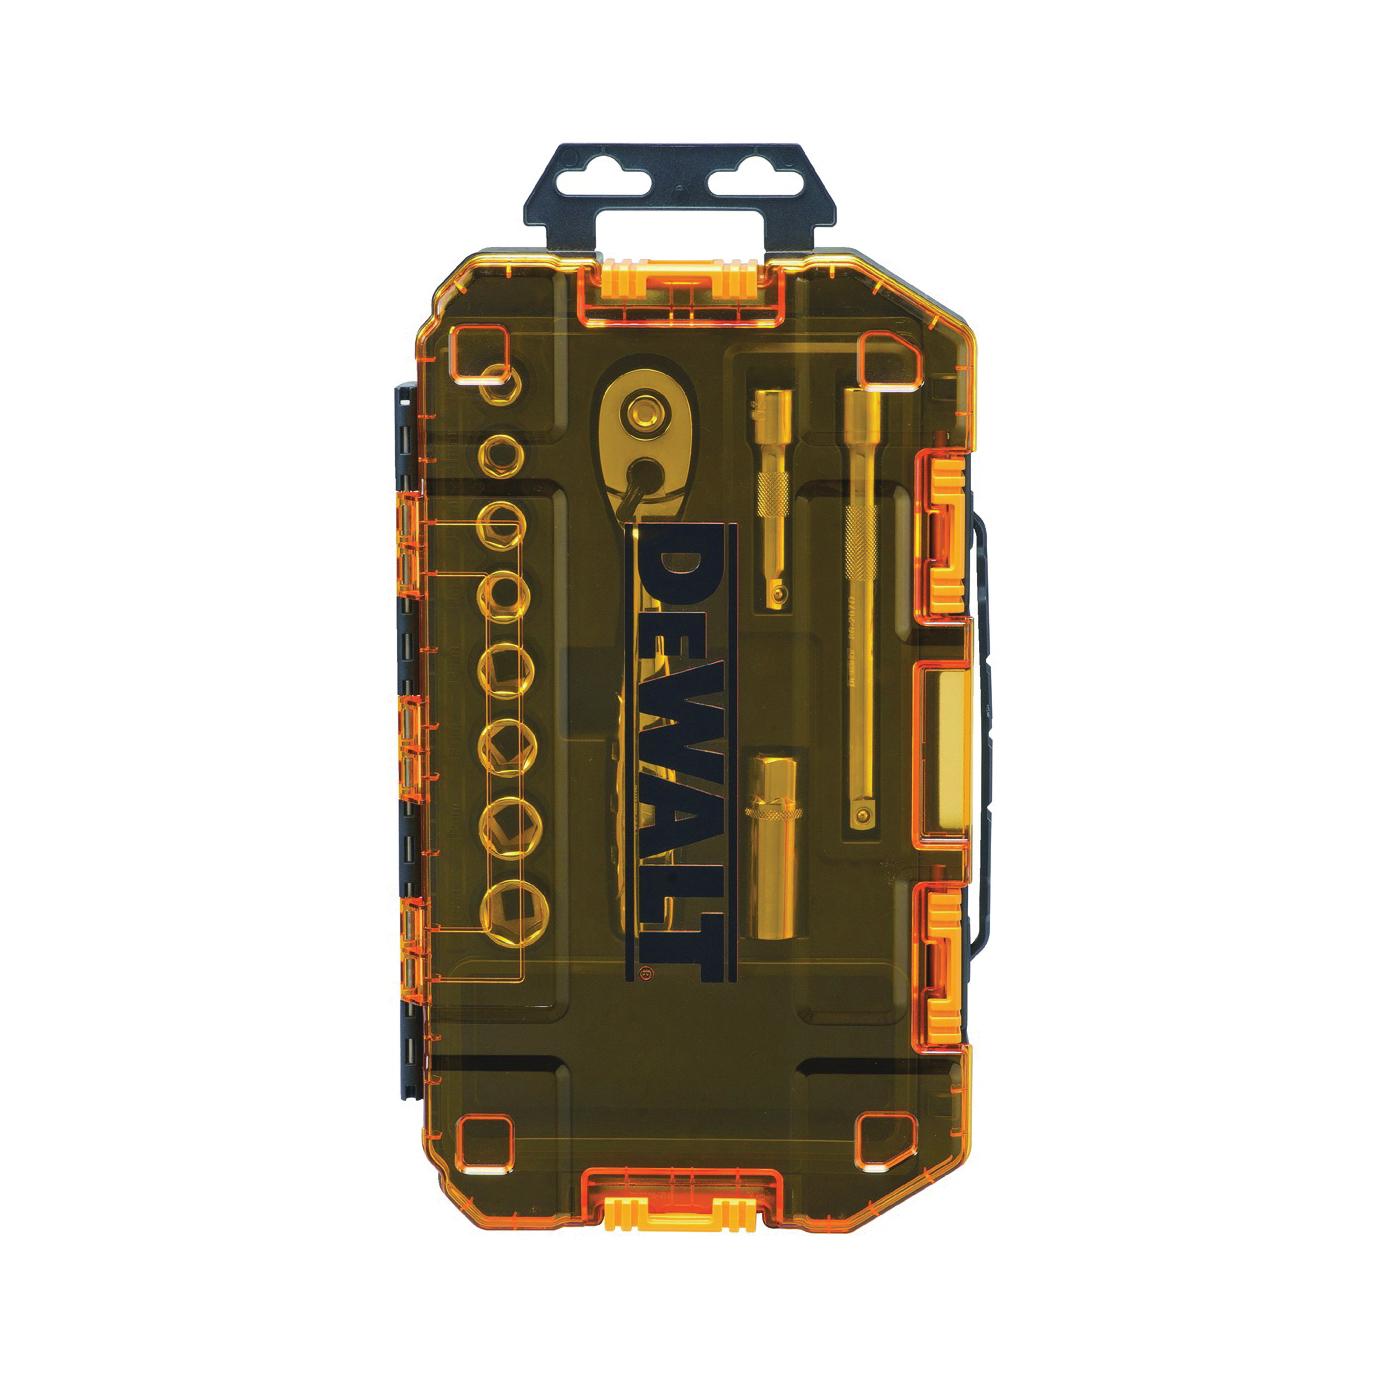 Picture of DeWALT DWMT75421 Socket Set, Specifications: 3/4 in Drive Size